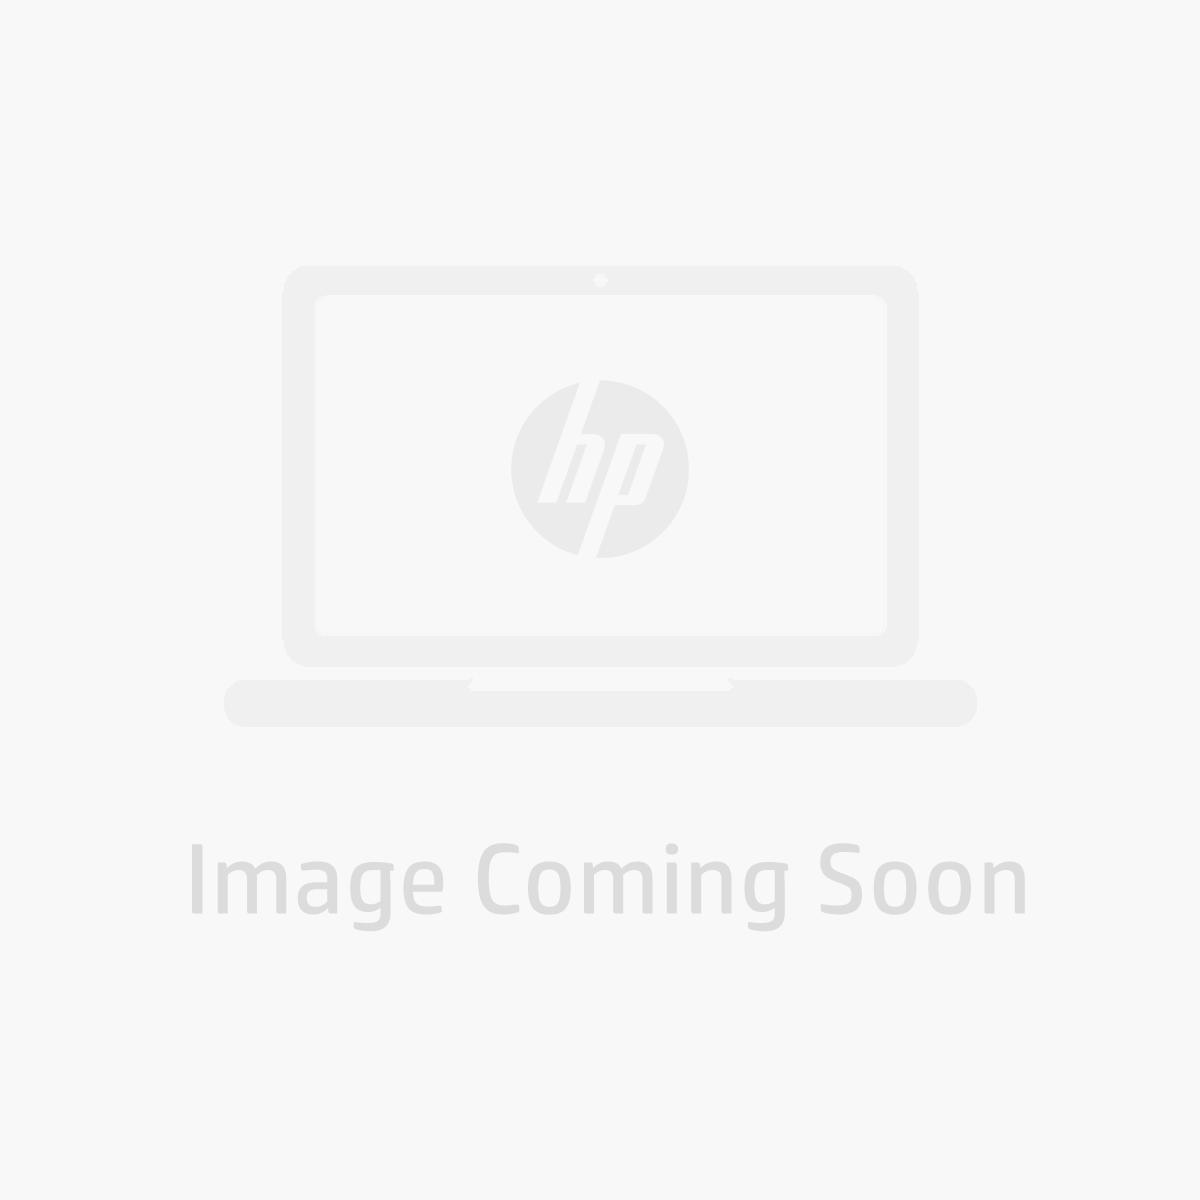 Hp Pavilion Intel Core I7 Processor 10th Gen 13 An1003ni 13 Fhd Laptop In Natural Silver Hp Pavilion Hp Laptops Hp Shop